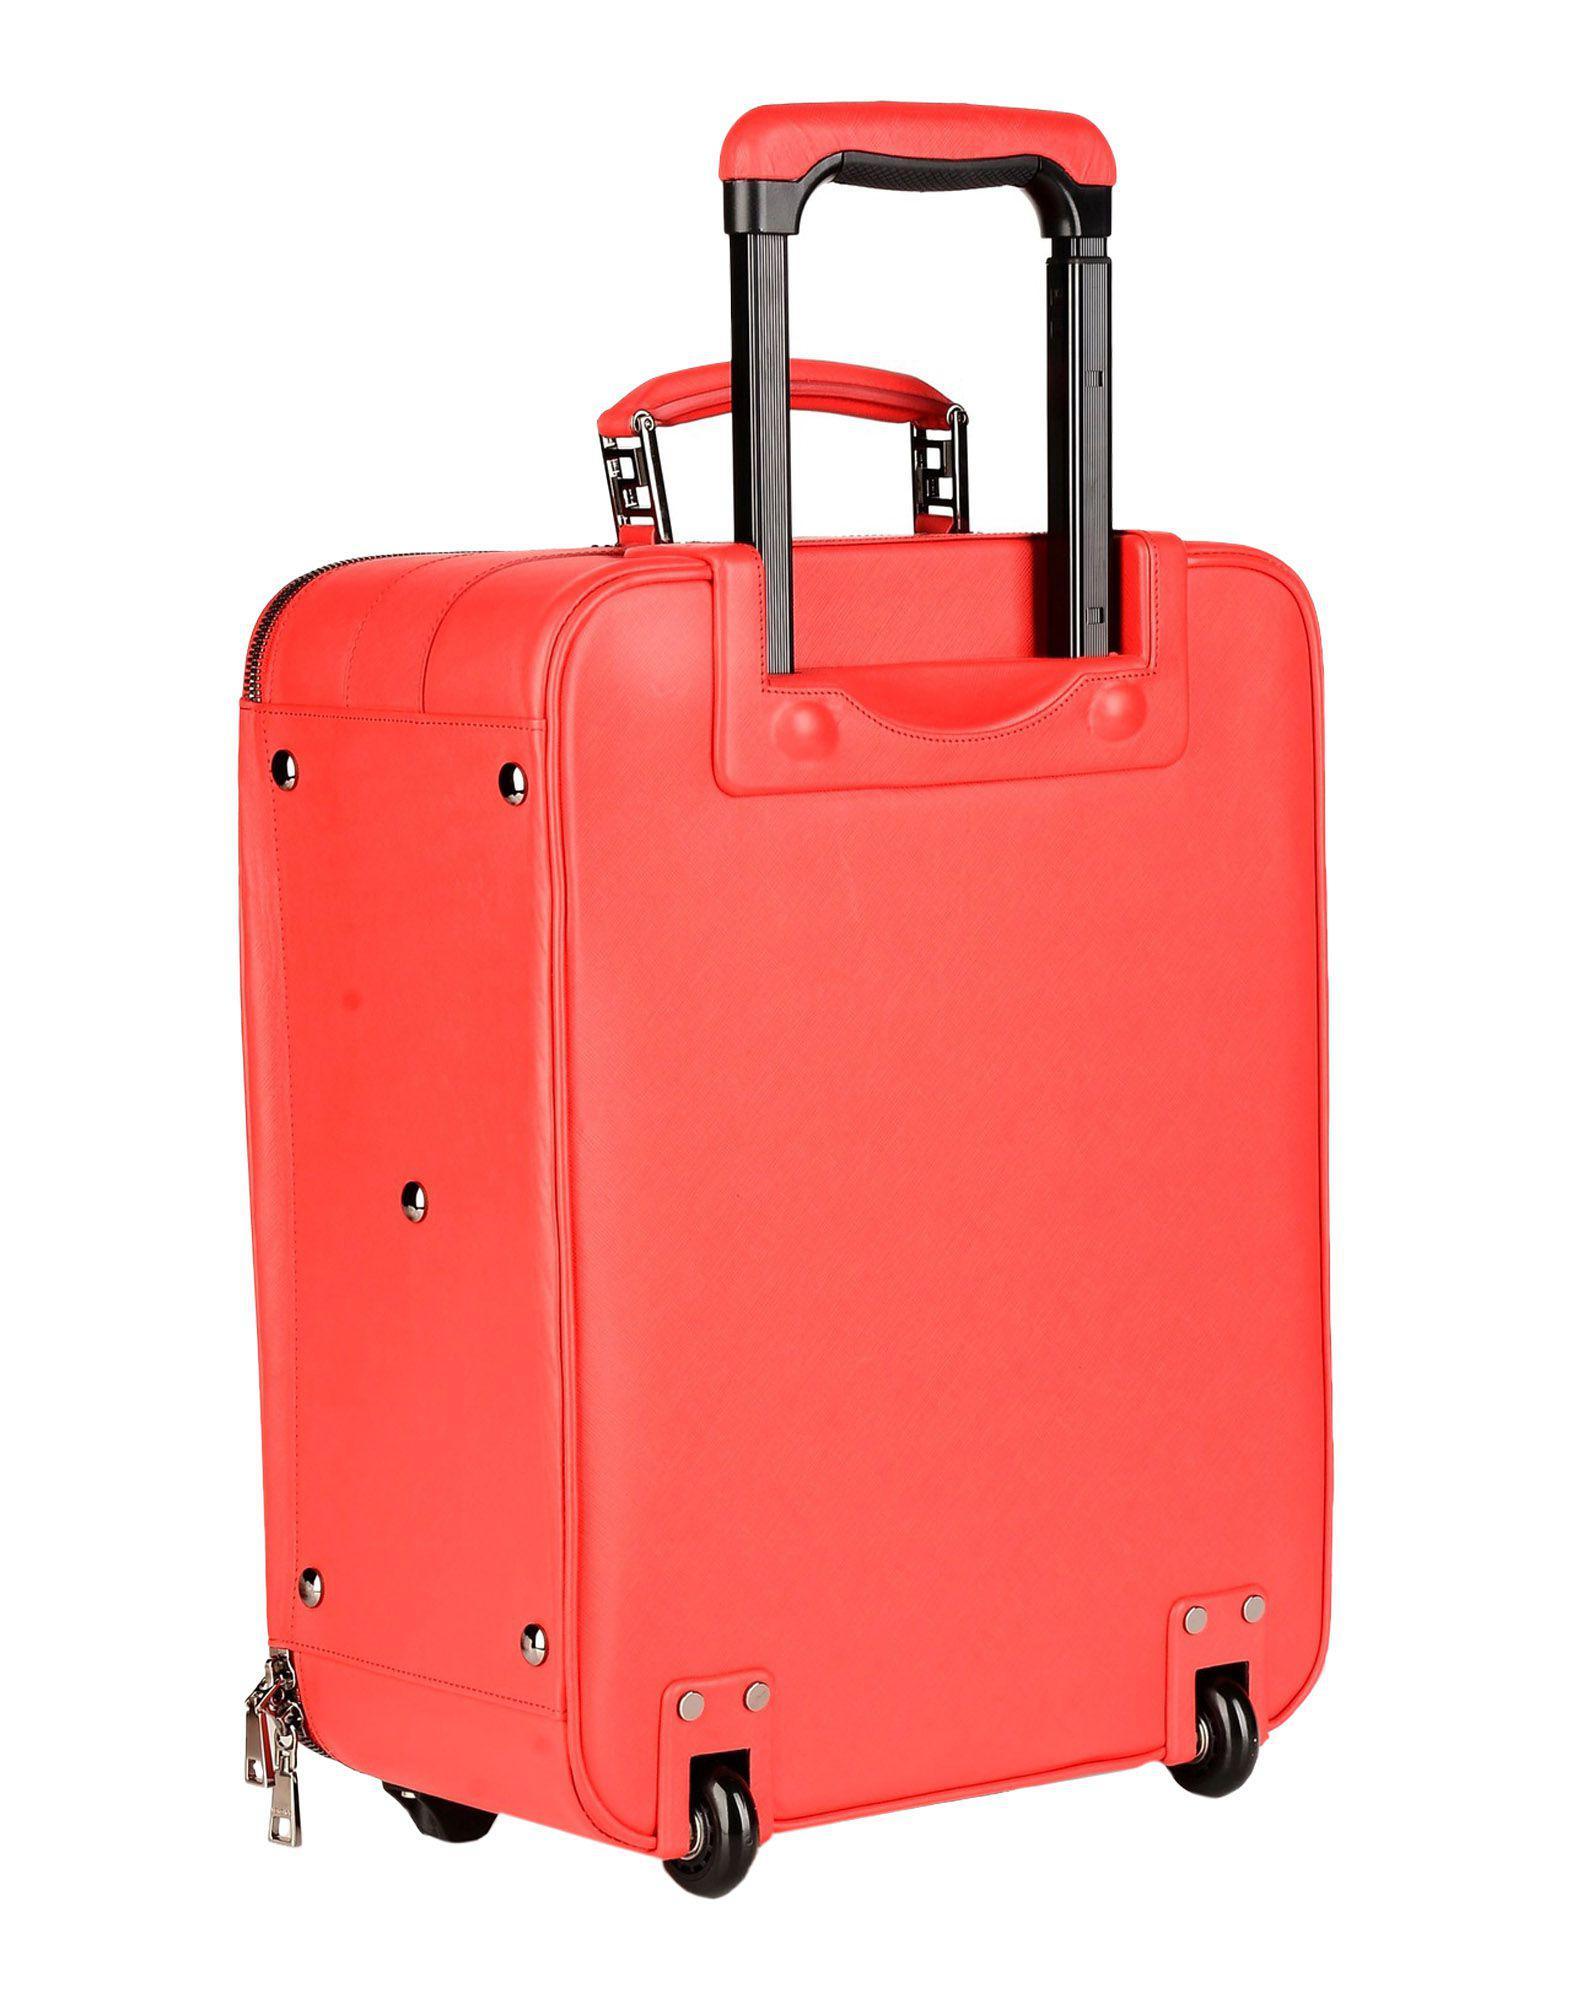 LUGGAGE - Wheeled luggage Versace 91gPk